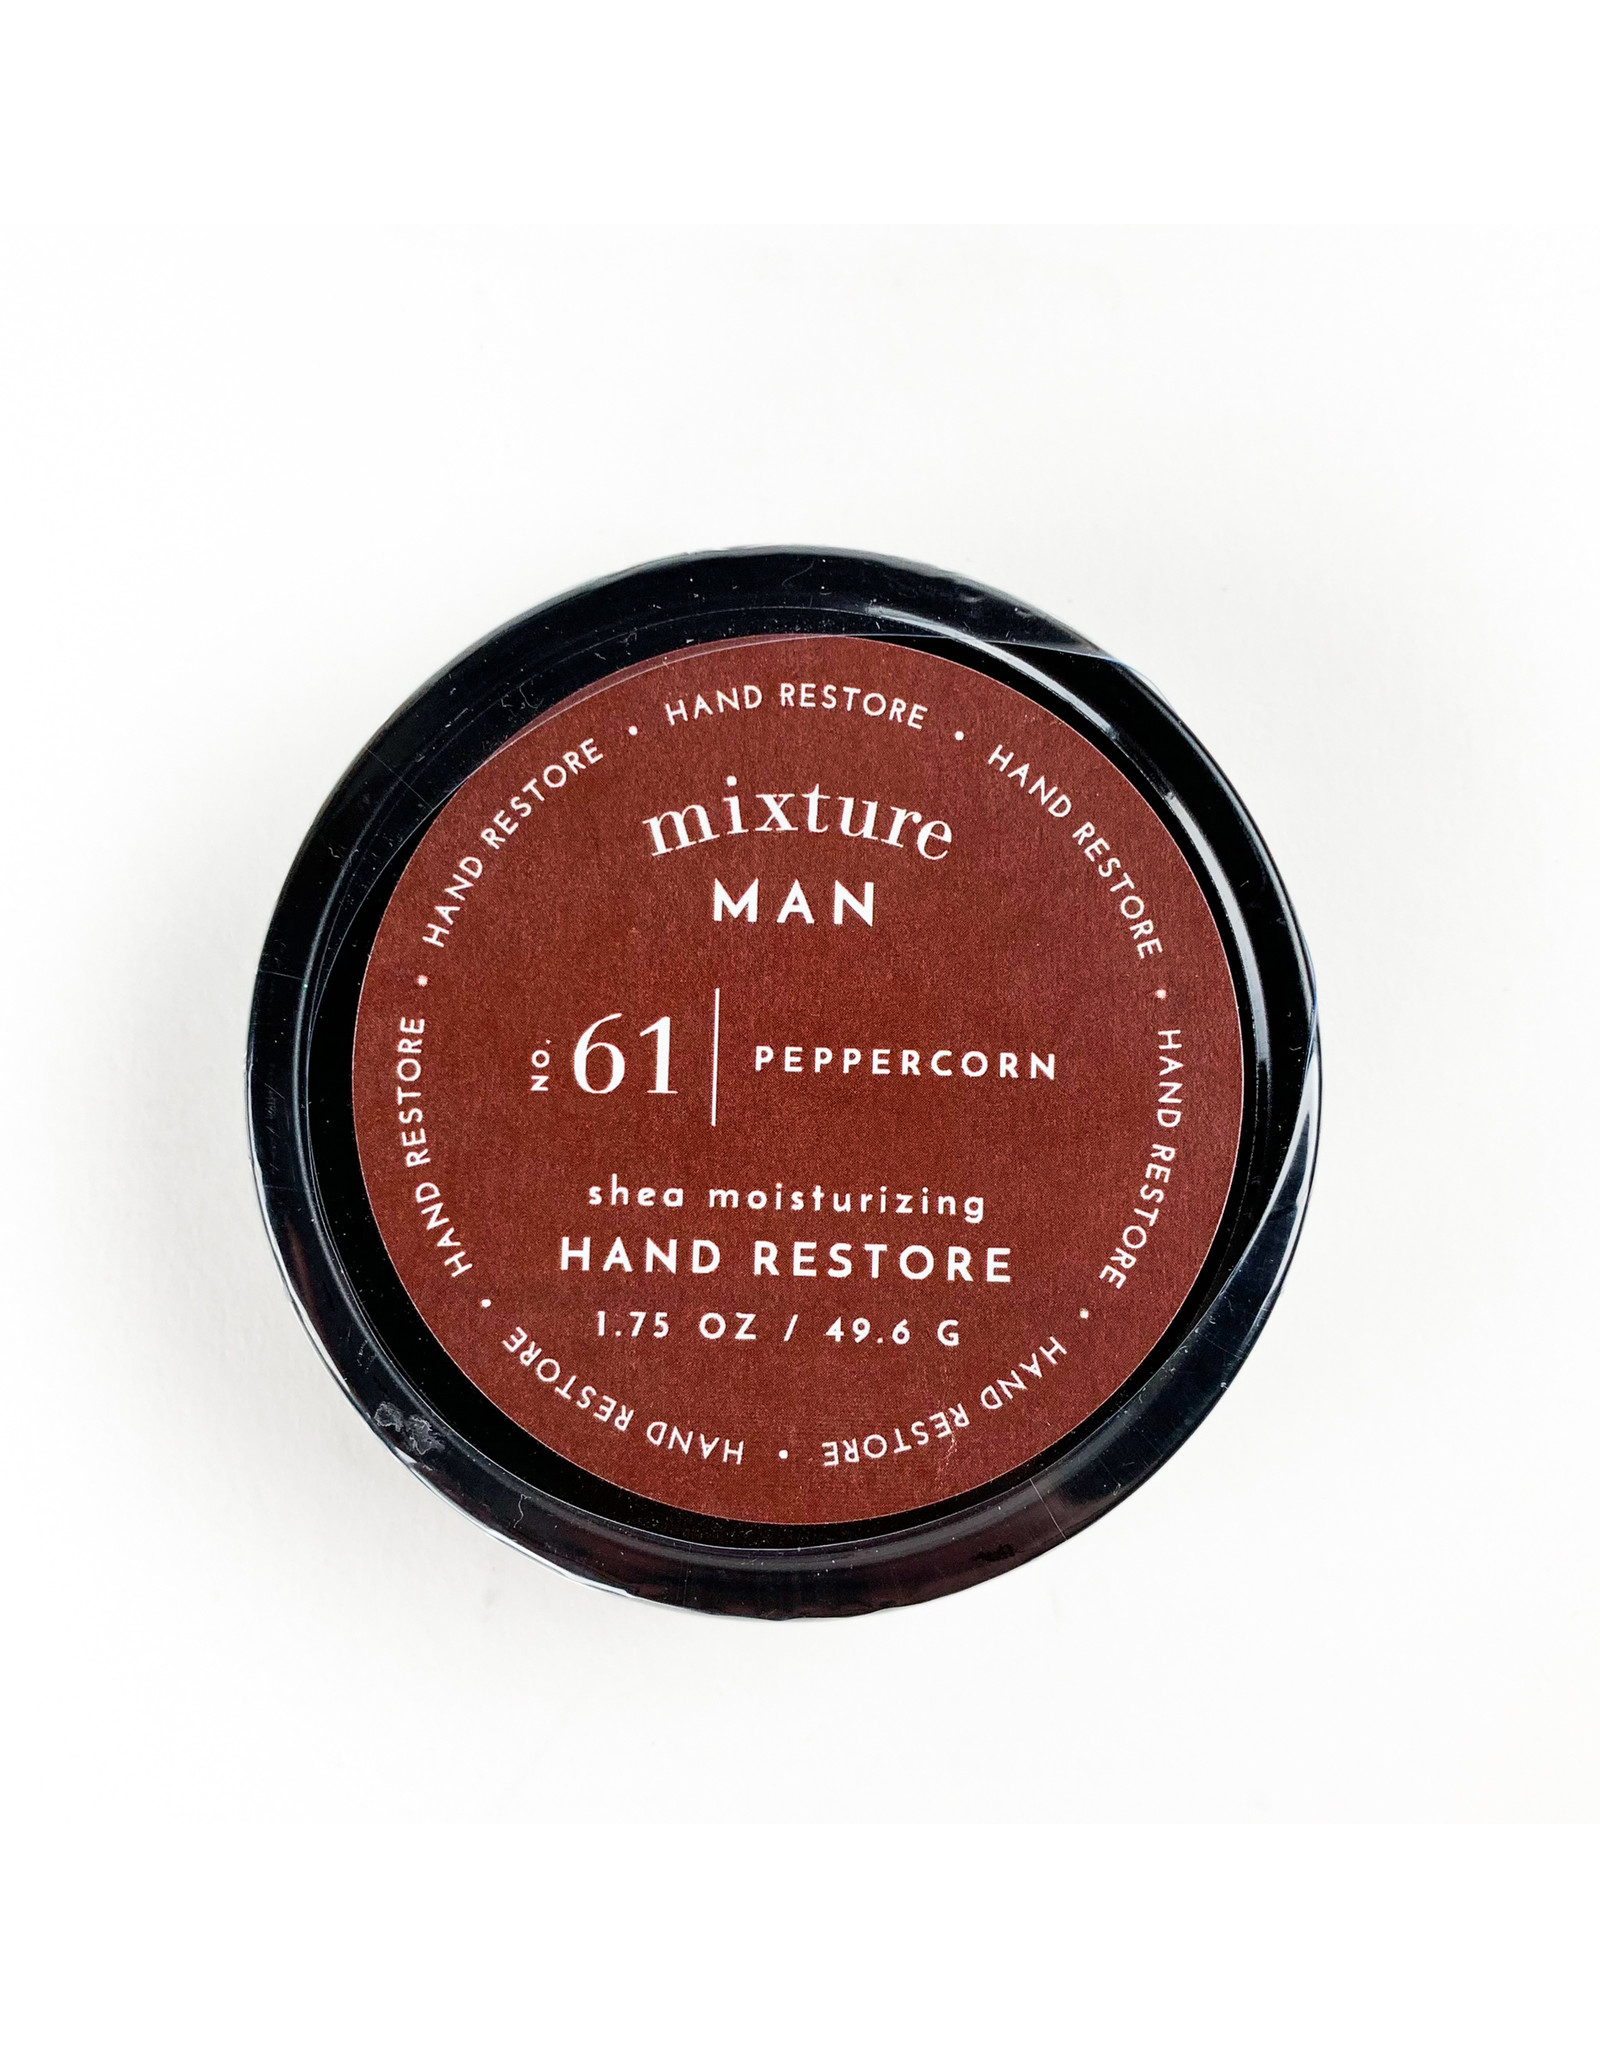 Peppercorn Hand Restore